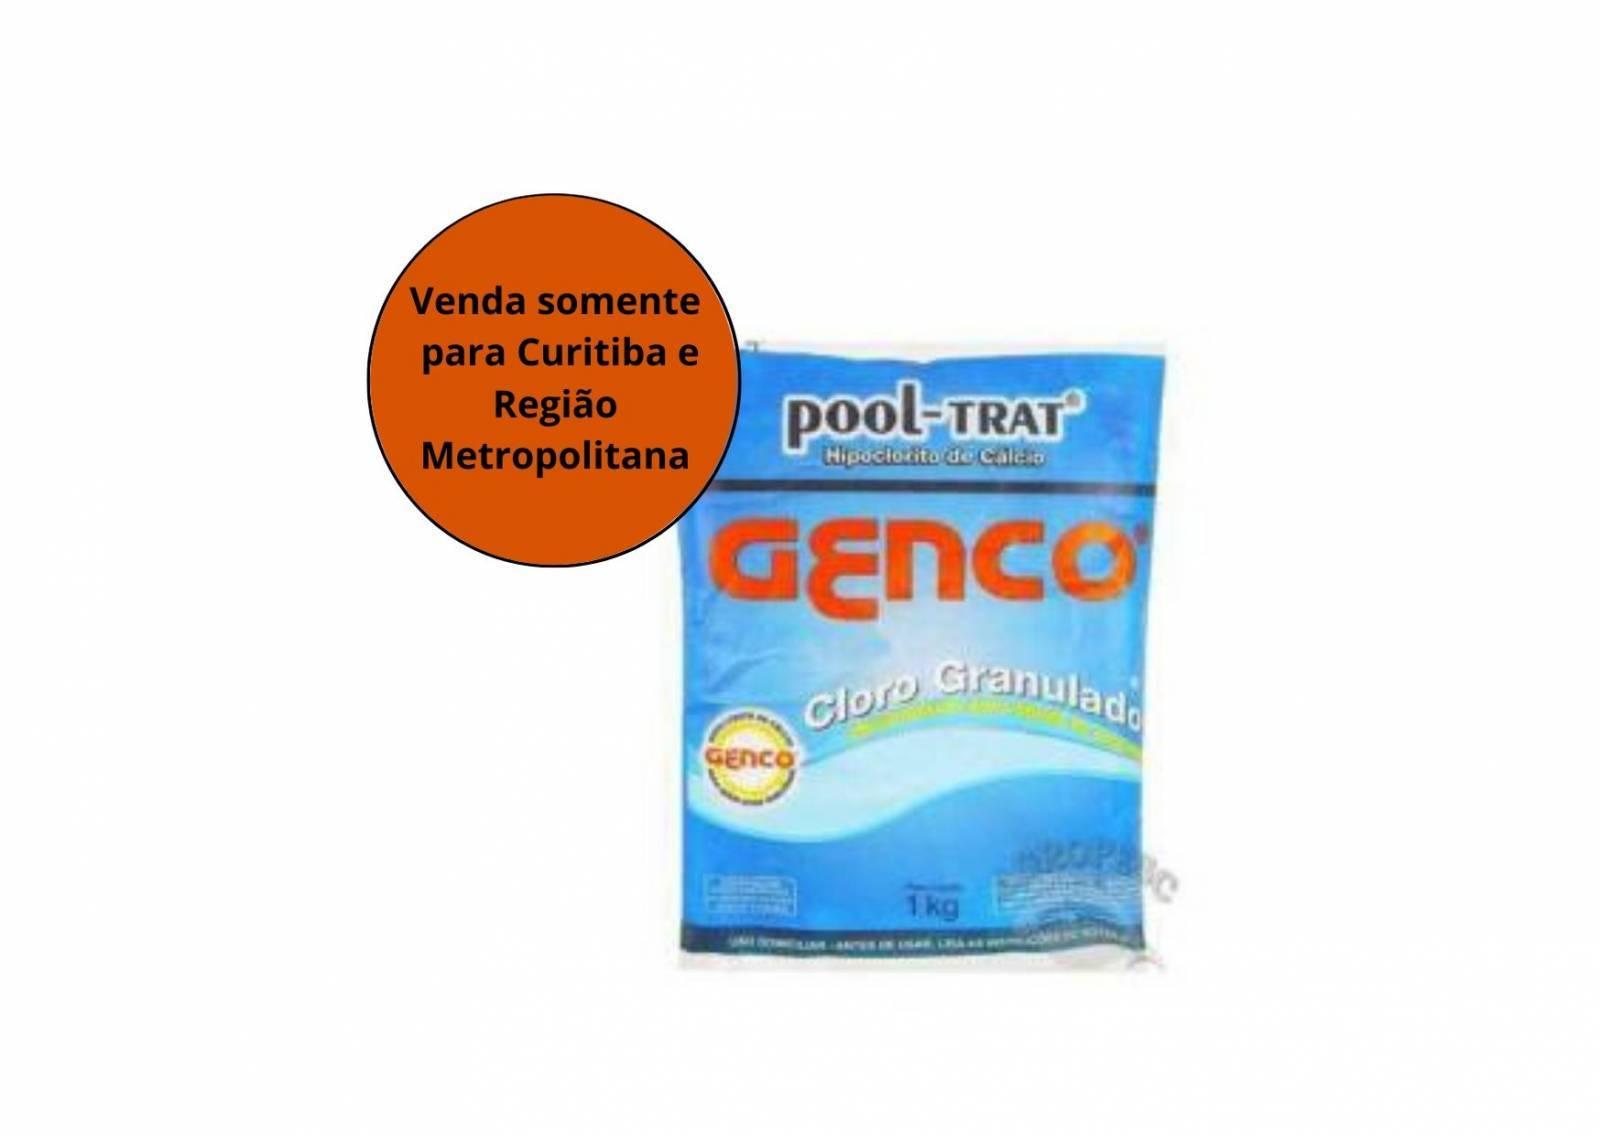 Cloro Hipoclorito Pool-Trat Premium 1KG Genco - MATERGI MATERIAIS DE CONSTRUÇÃO